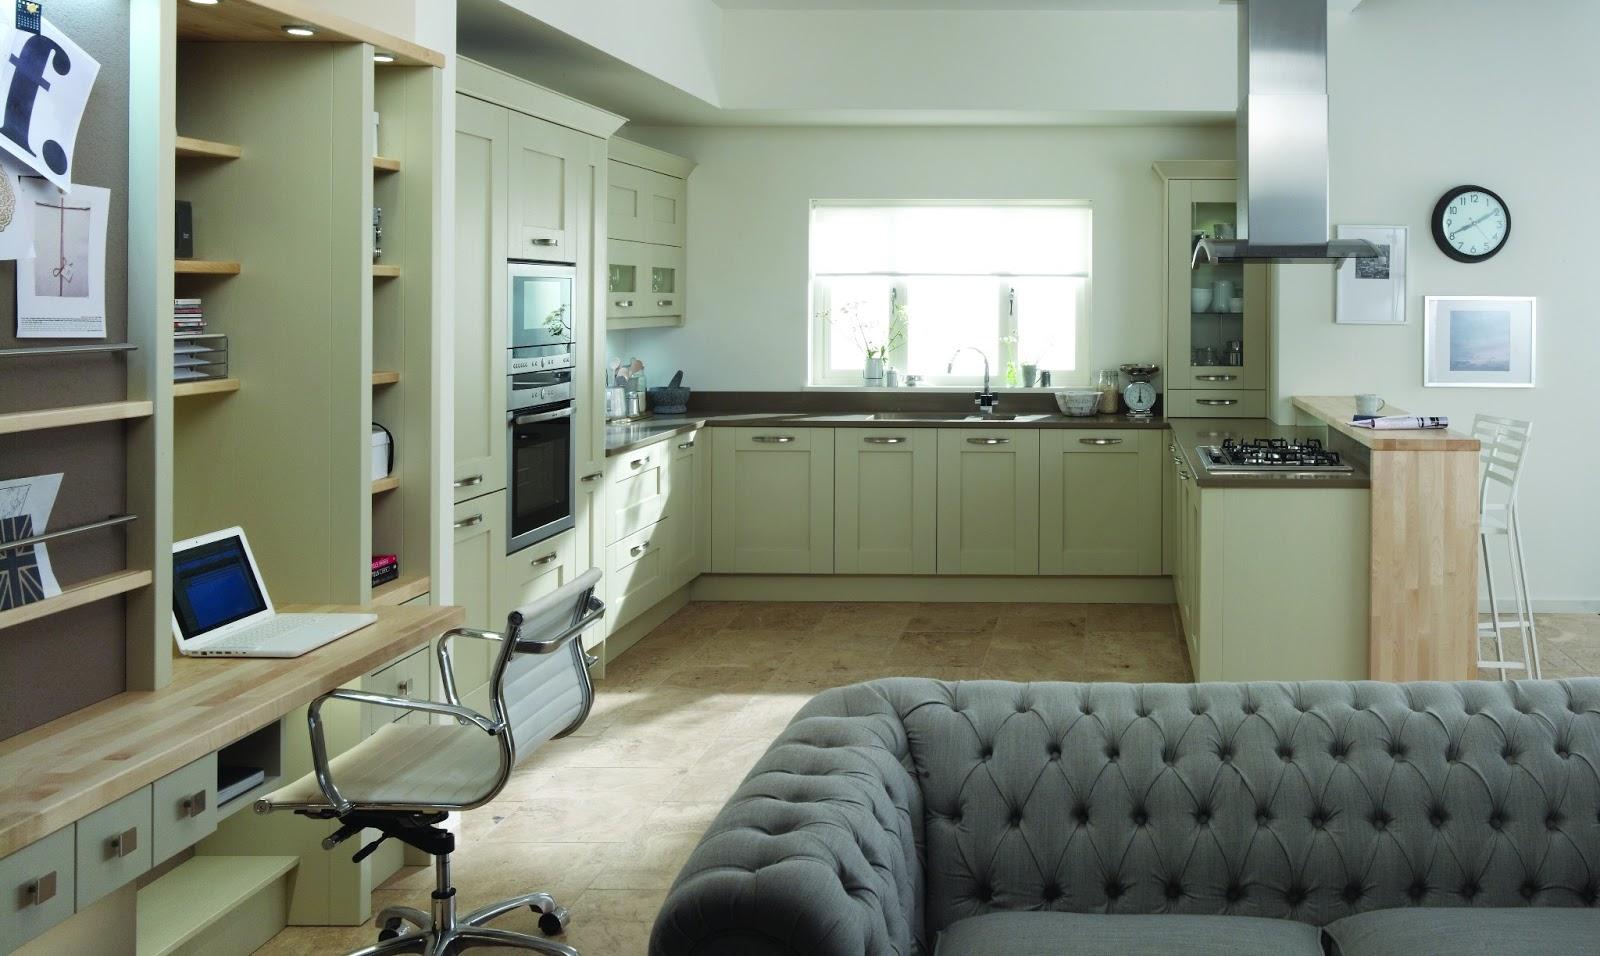 Kitchen Designers Glasgow Glenlith Interiors Blog Champagne Kitchen With A Beer